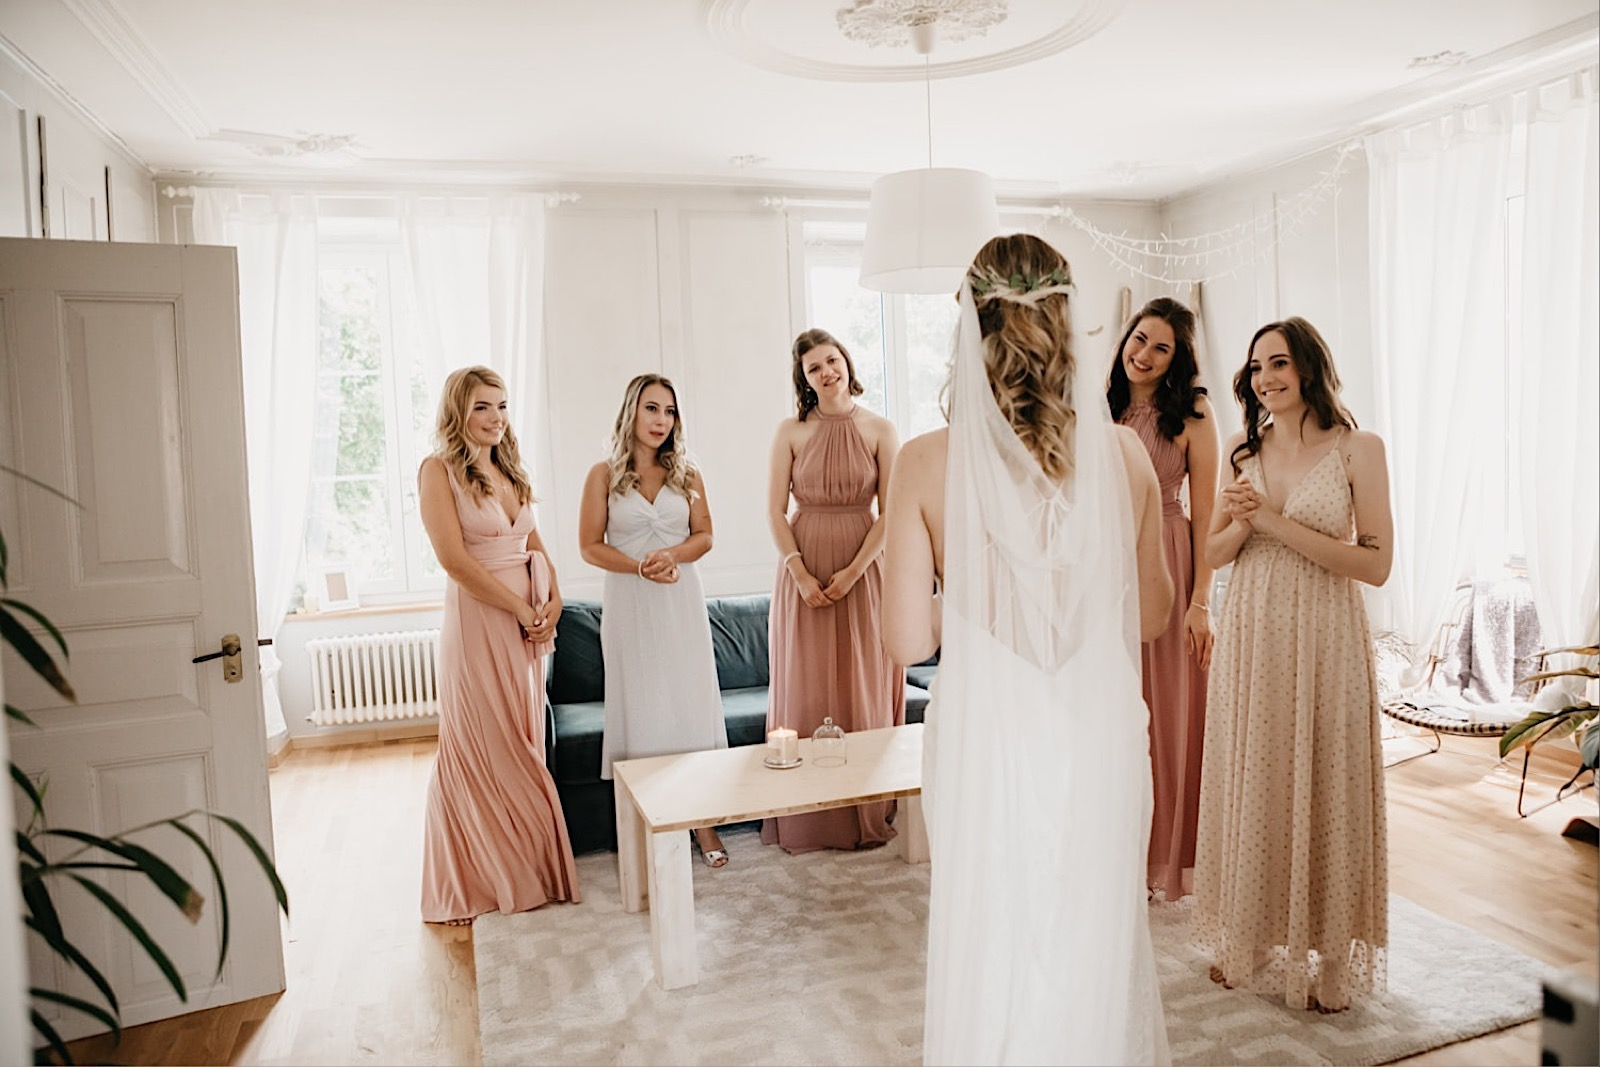 24_getting_ready_bride_groom_bohowedding (40 von 49).jpg